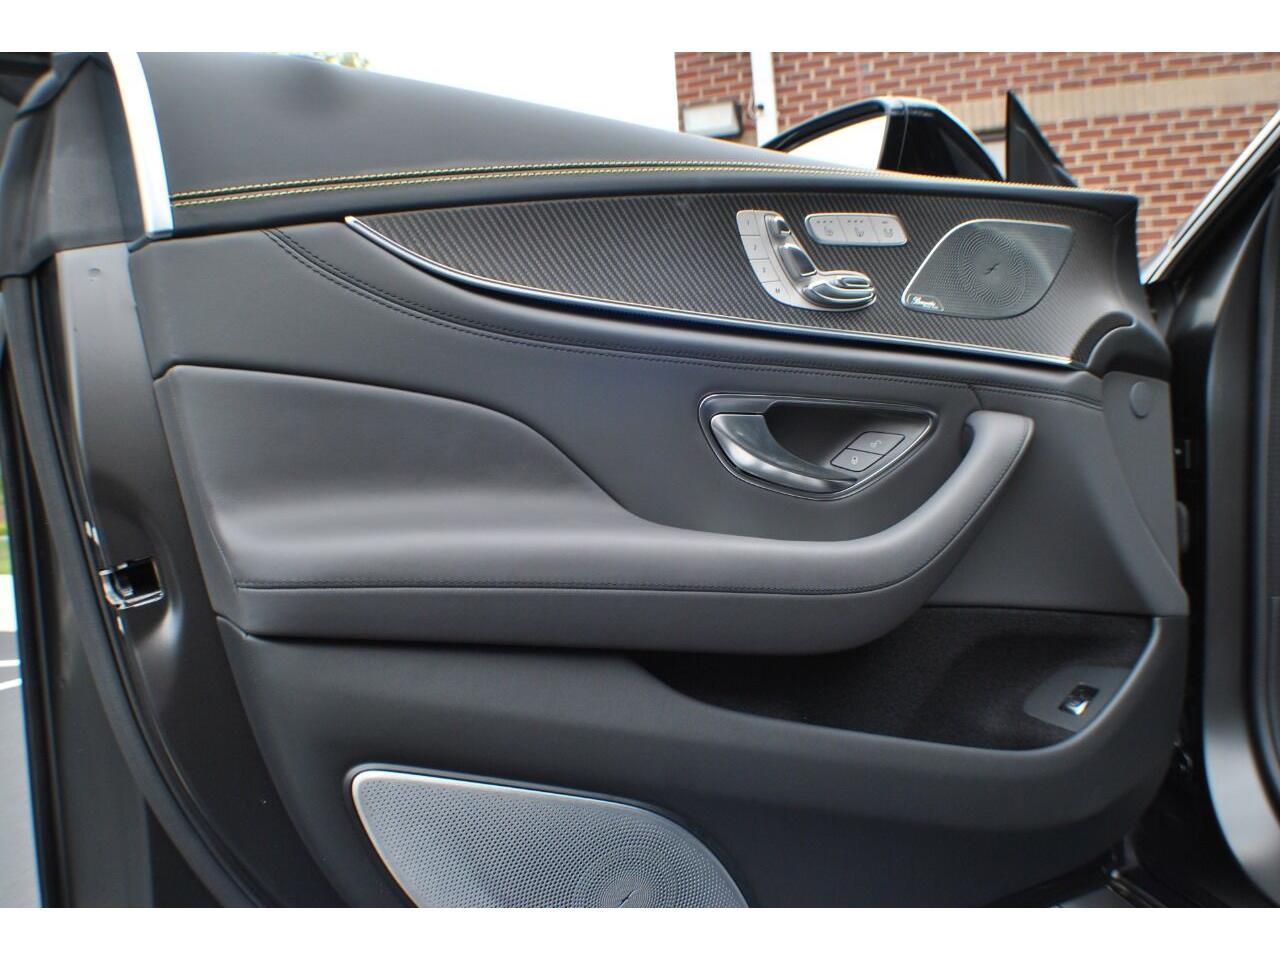 2019 Mercedes-Benz AMG (CC-1415162) for sale in Charlotte, North Carolina